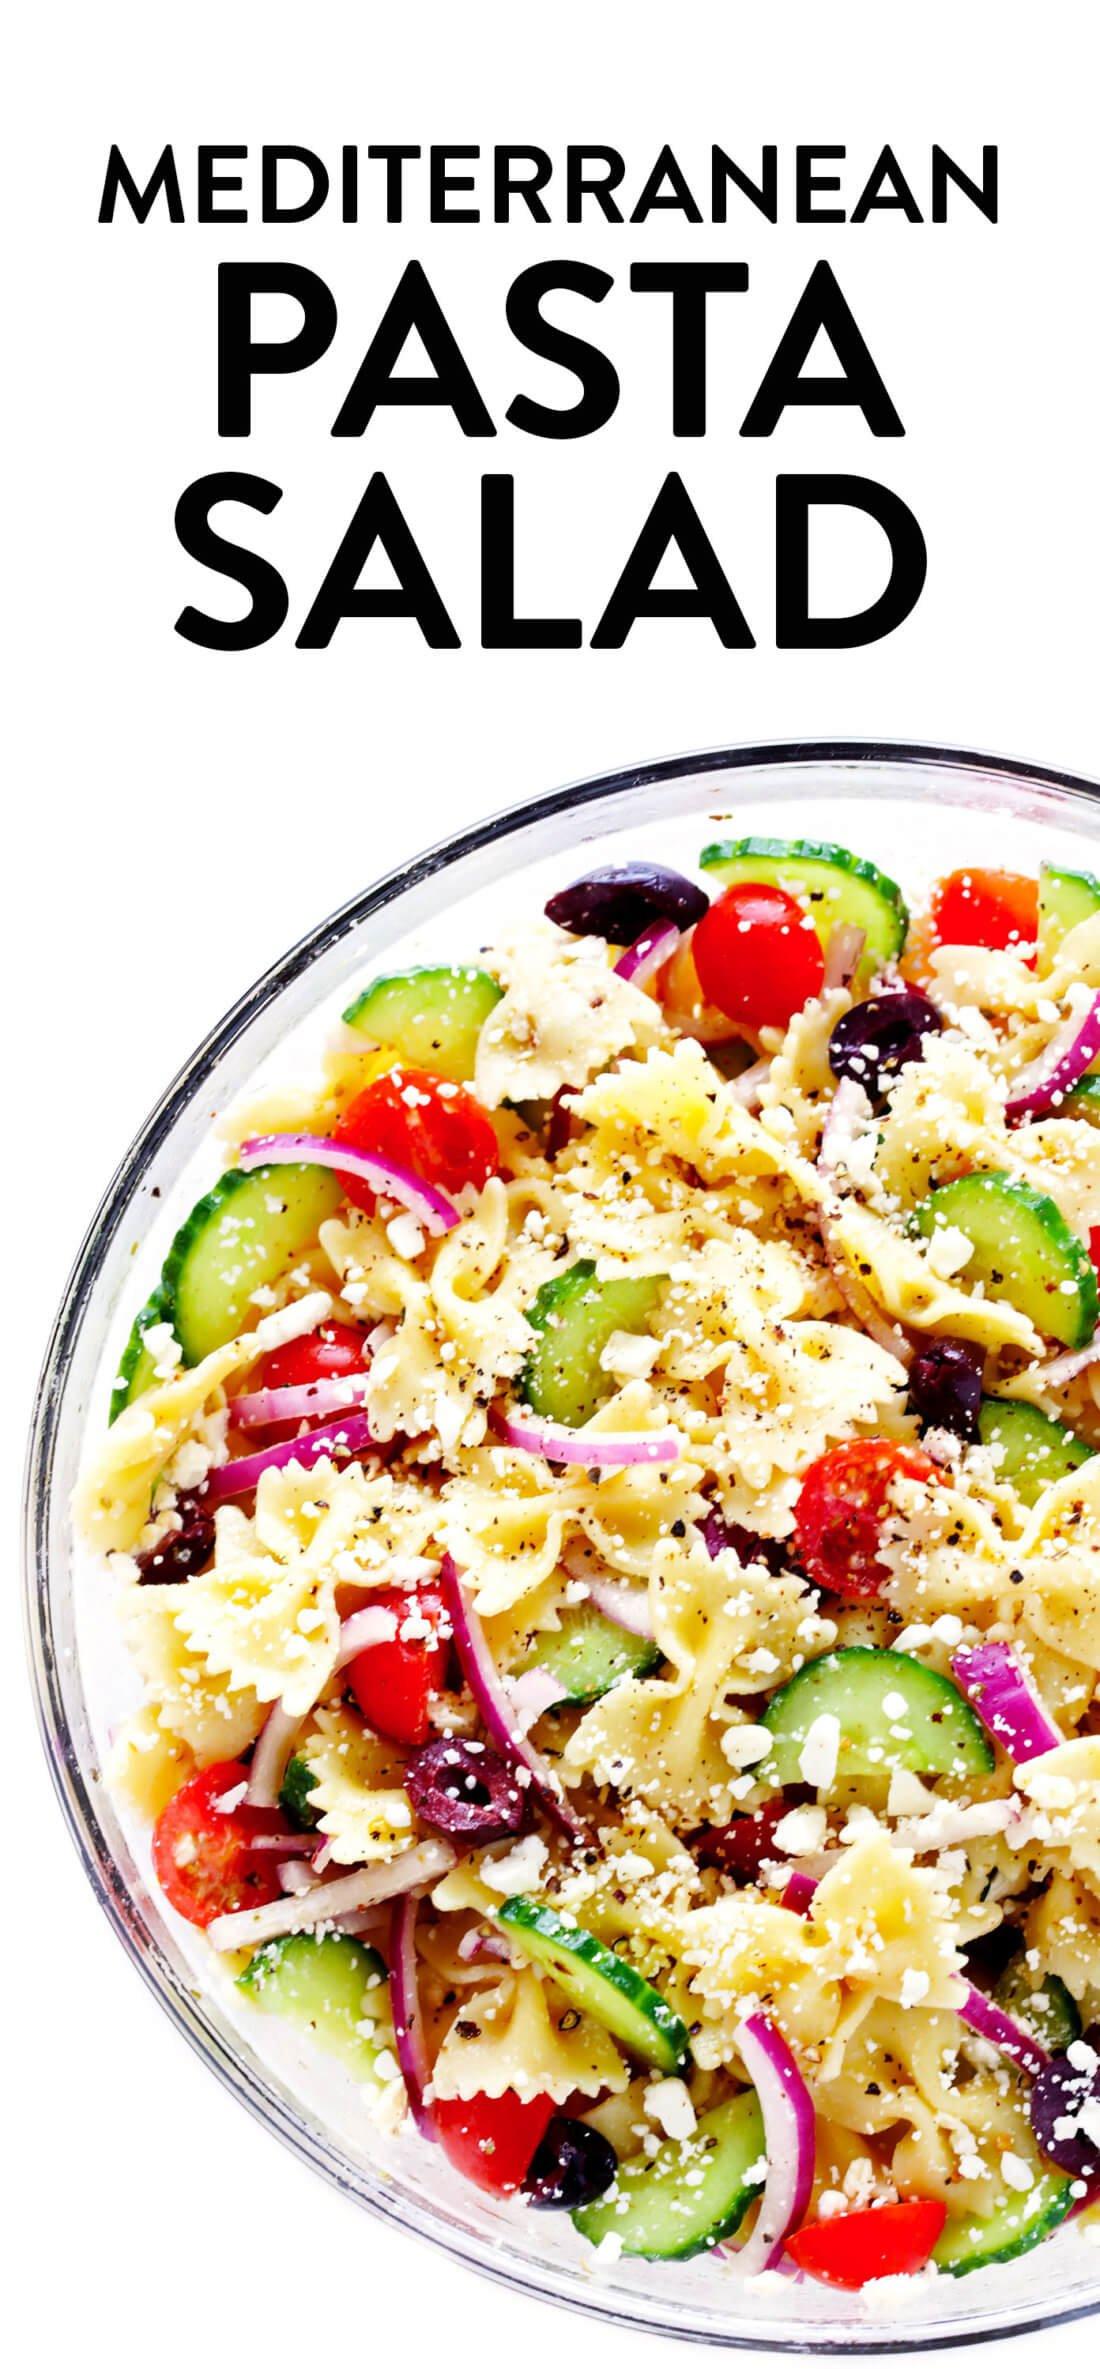 Mediterranean Pasta Salad Recipe with Greek Vinaigrette